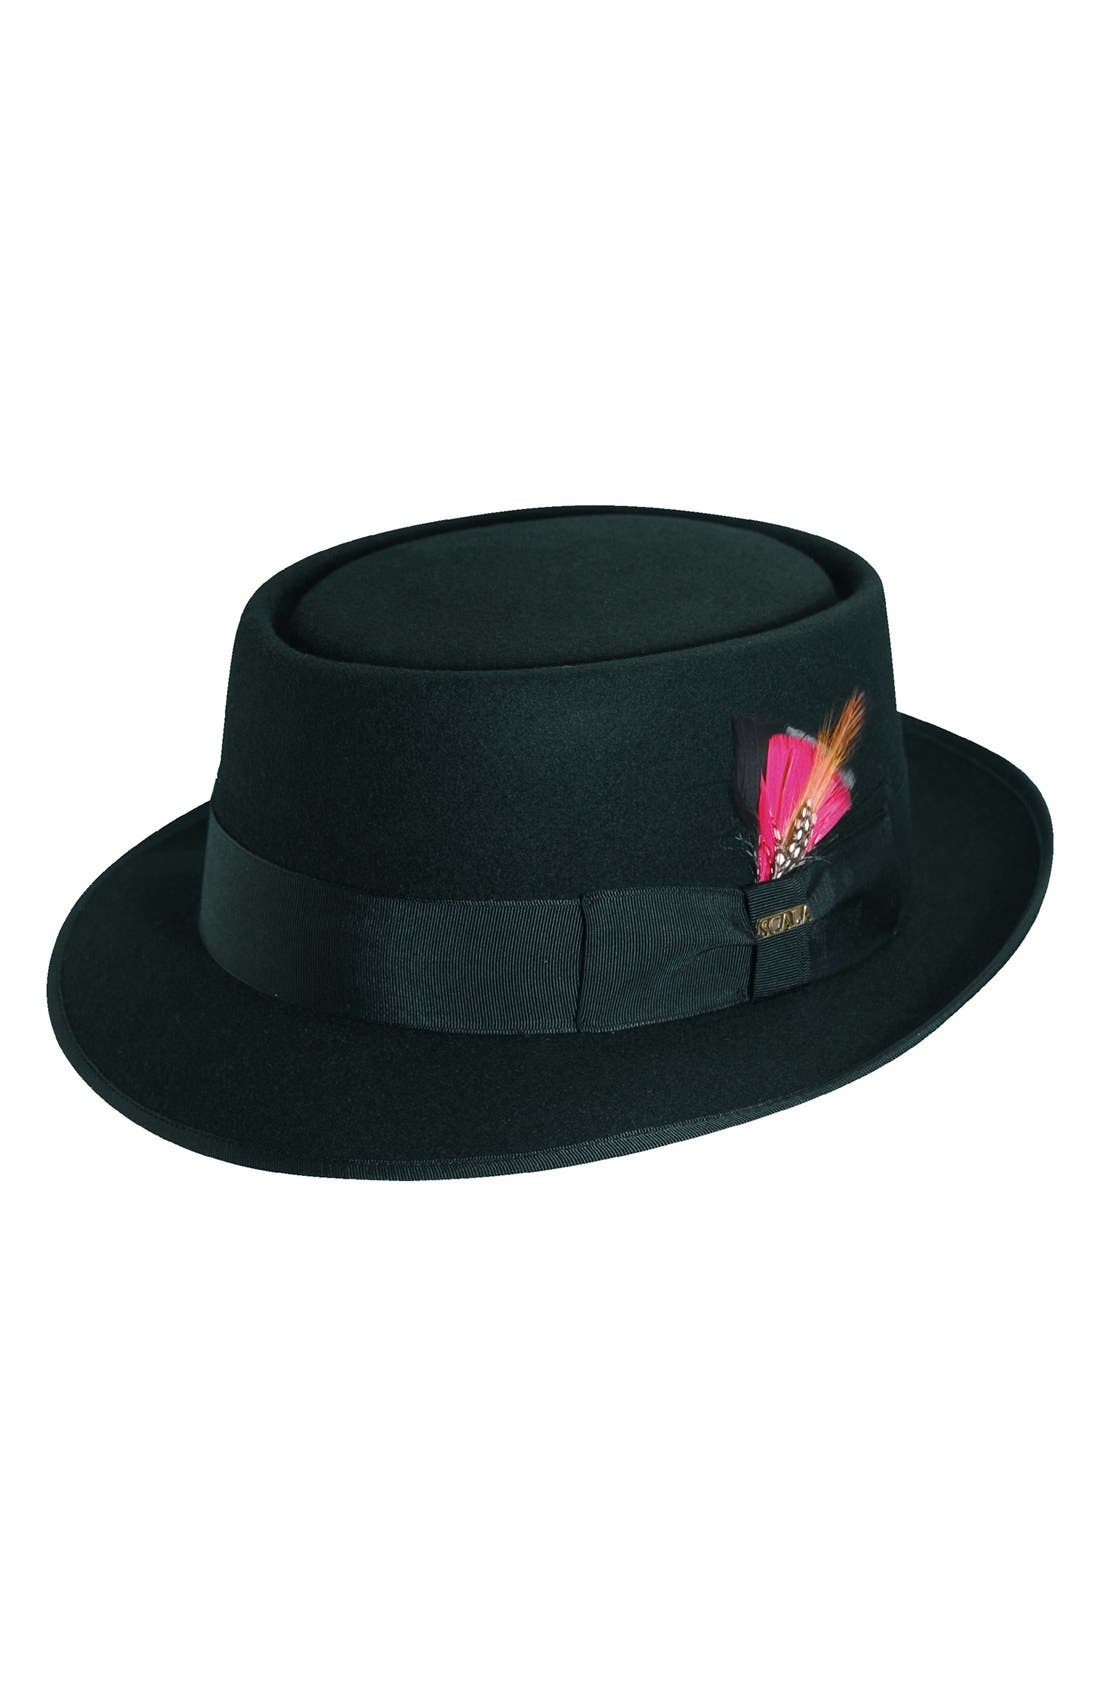 Main Image - Scala Wool Felt Porkpie Hat